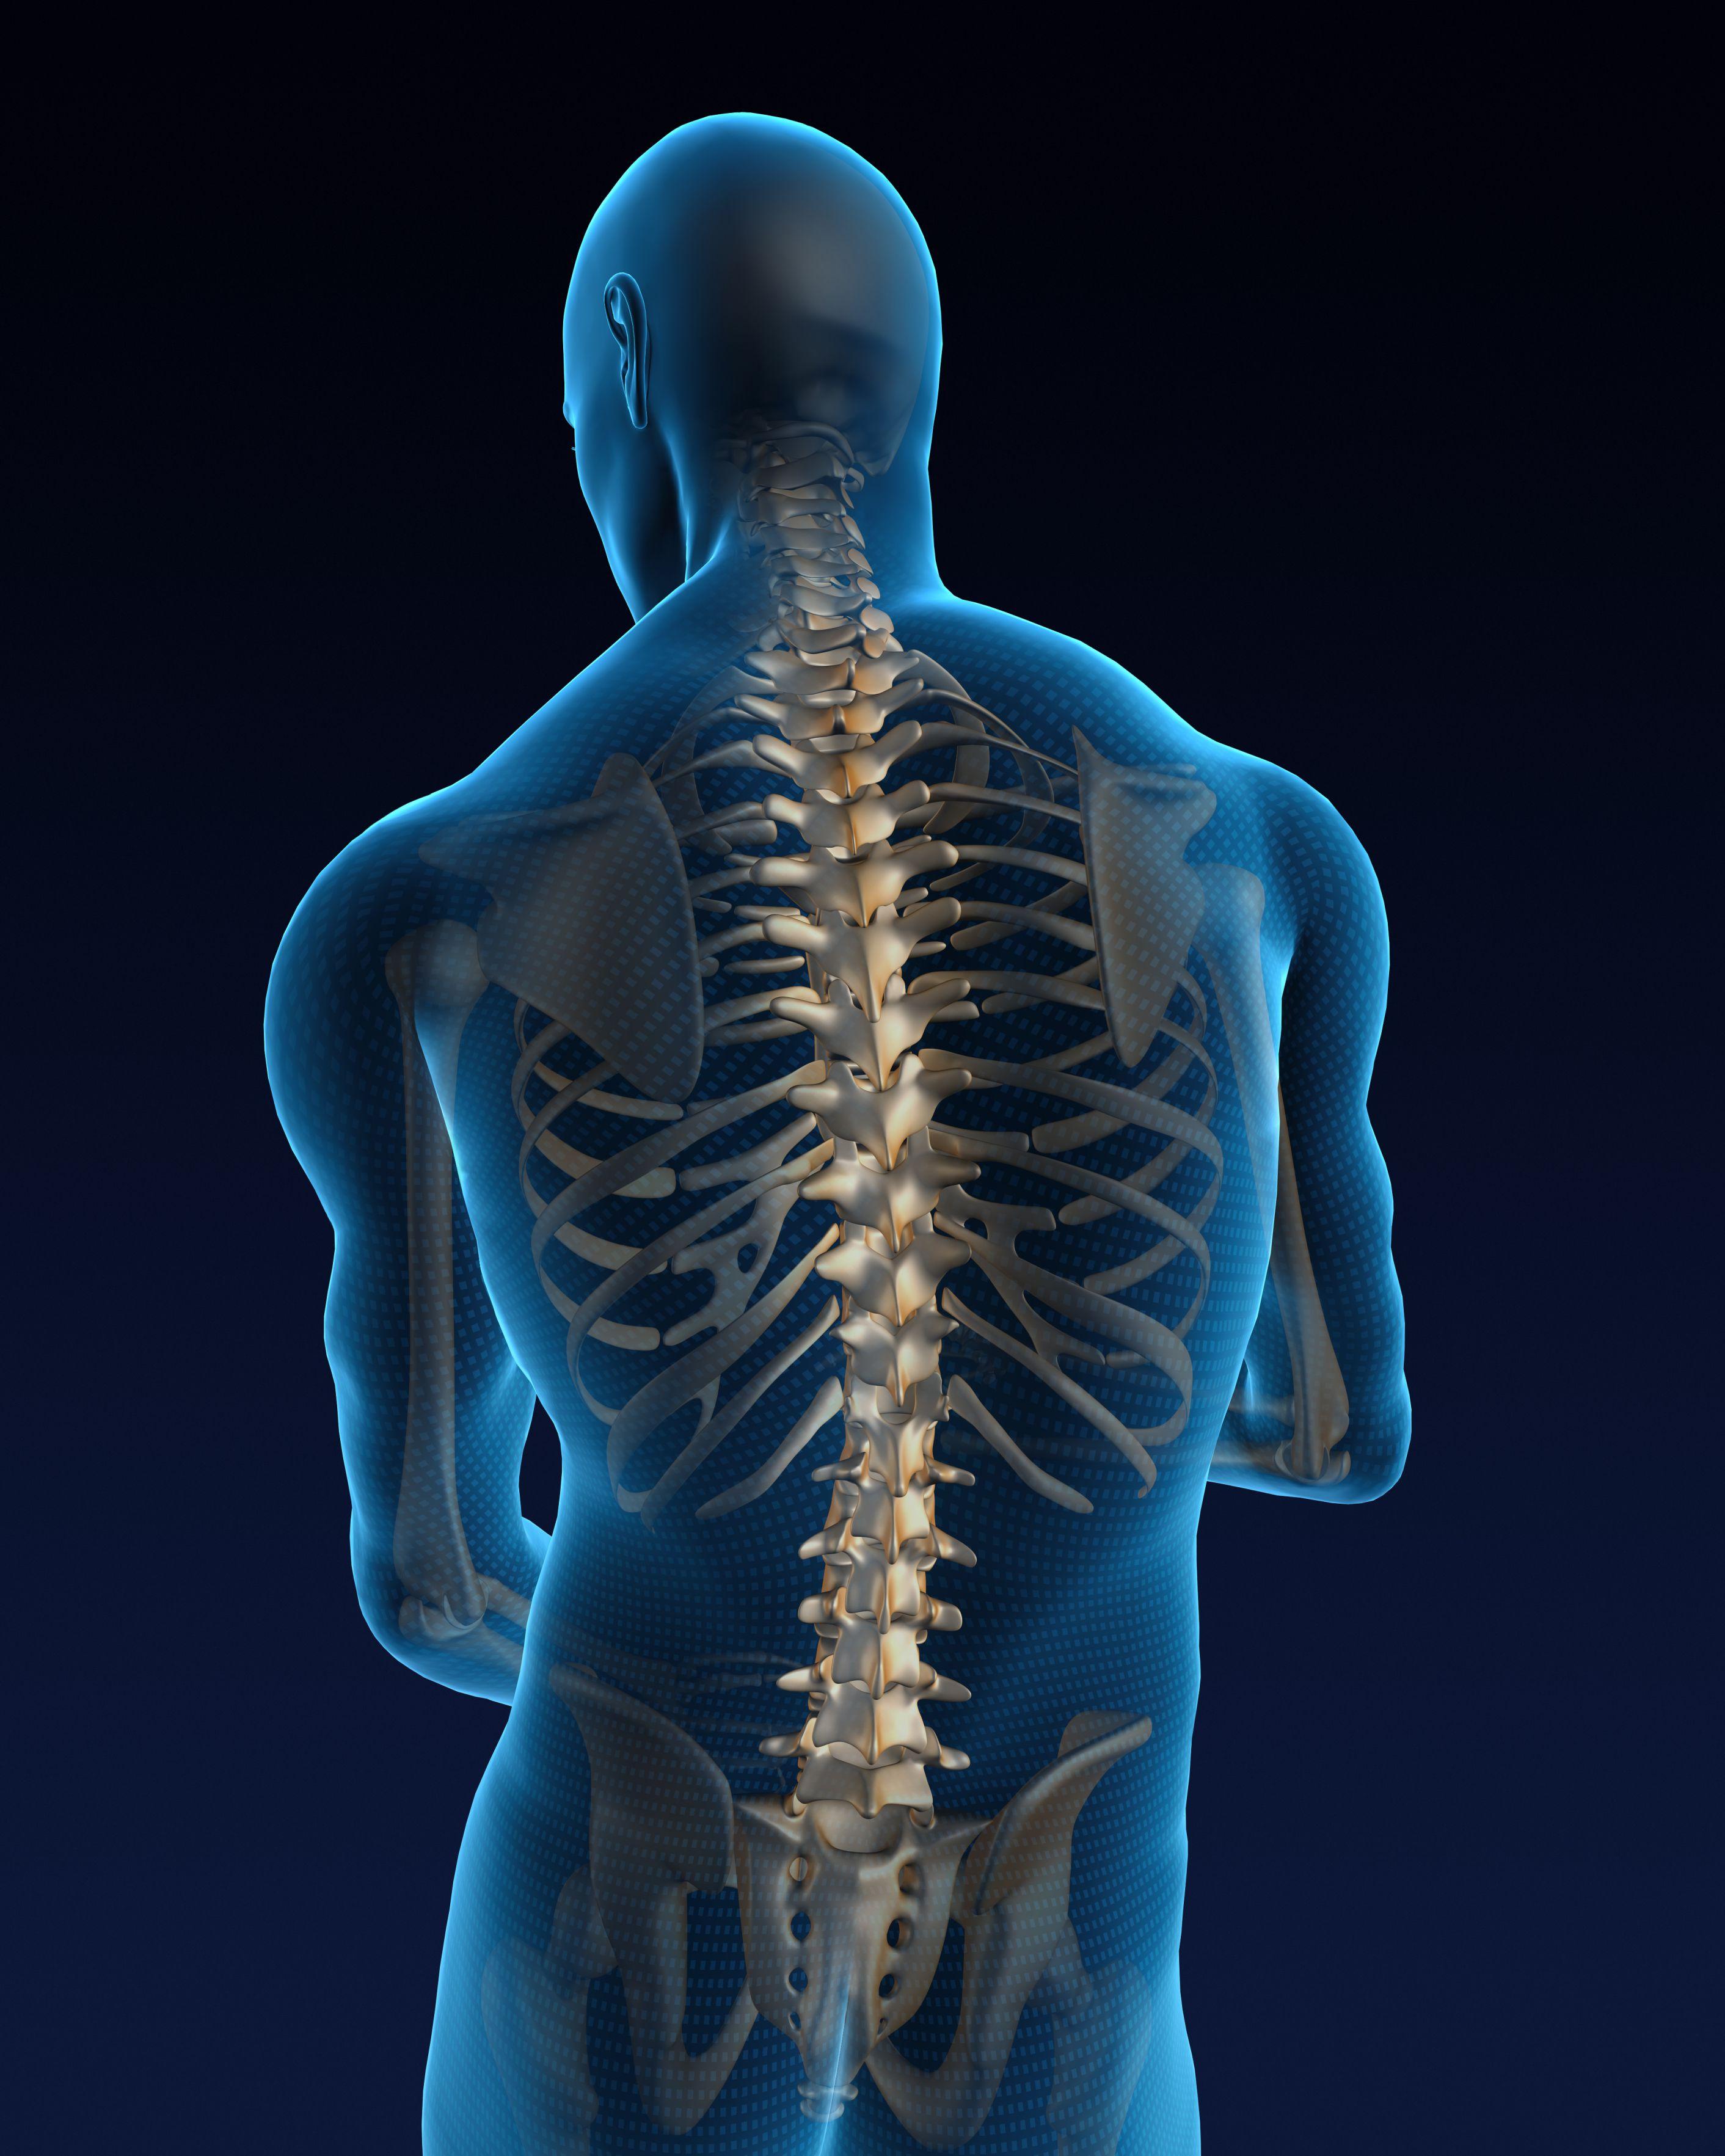 What Causes Ankylosing Spondylitis?